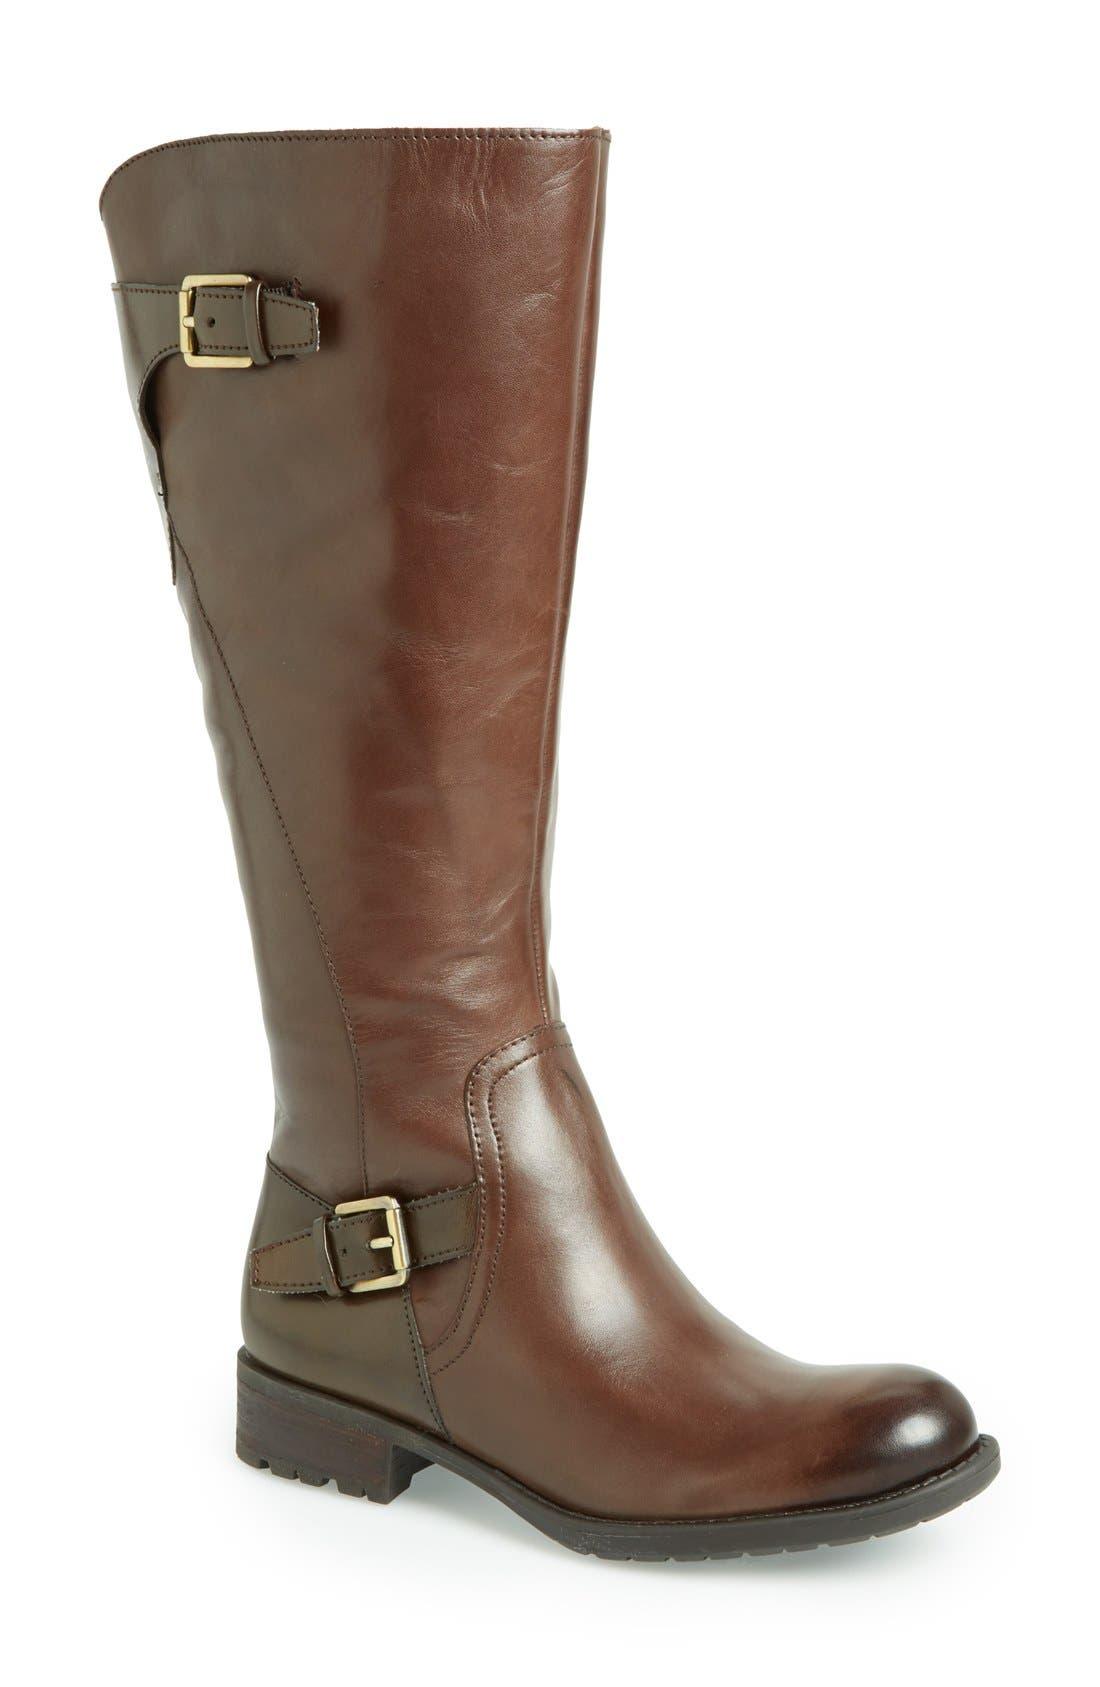 Main Image - Franco Sarto 'Perk' Tall Boot (Women)